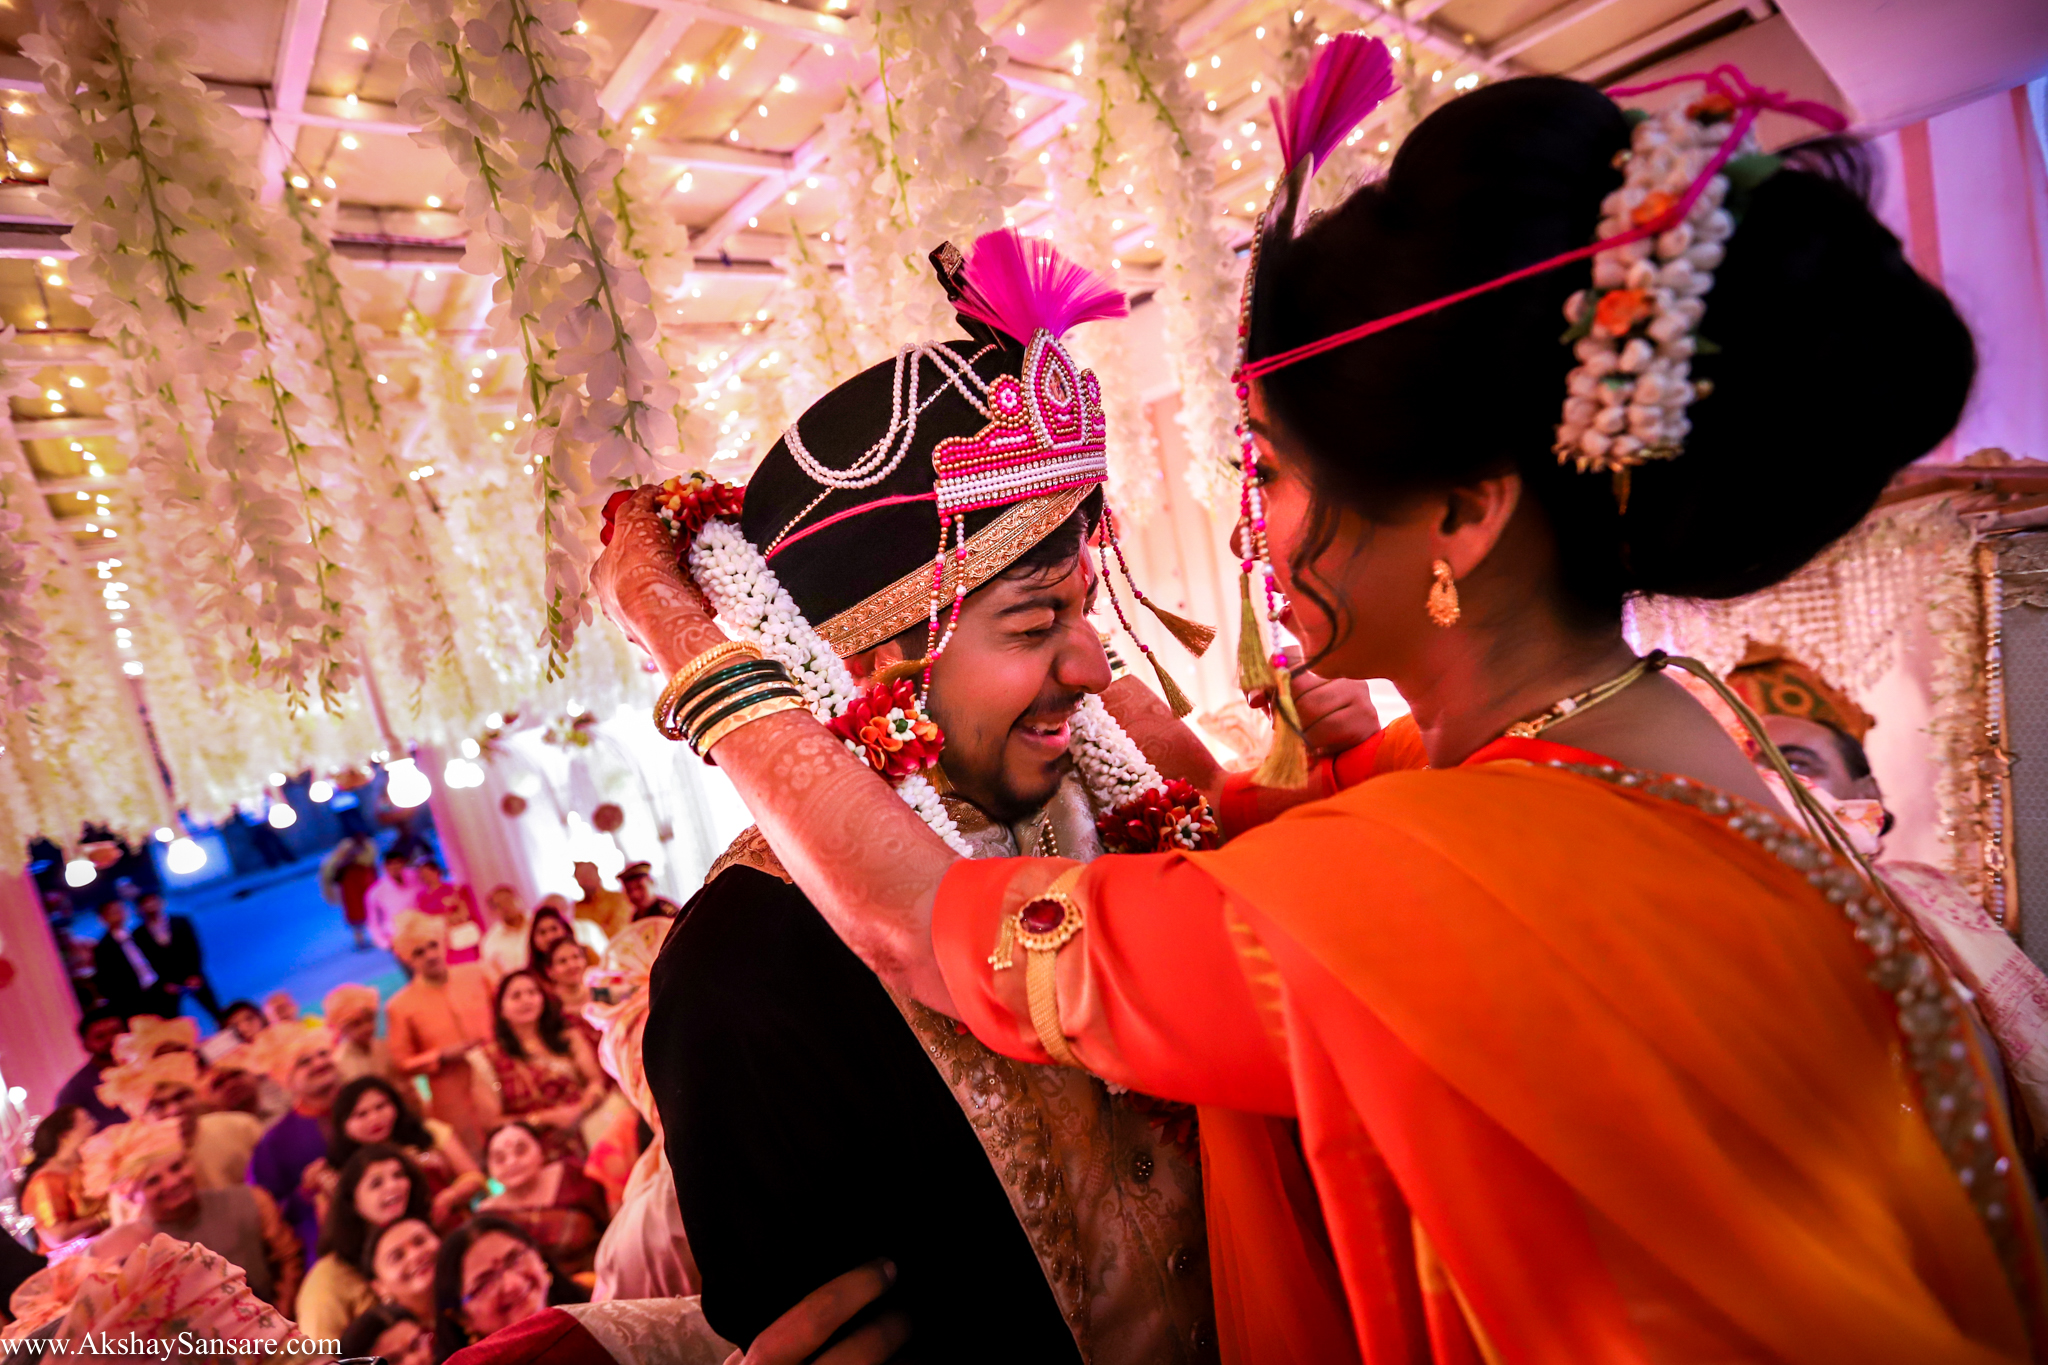 Nupur & Rohan wedding Akshay Sansare Photography best wedding photographer in mumbai India Candid(39).jpg